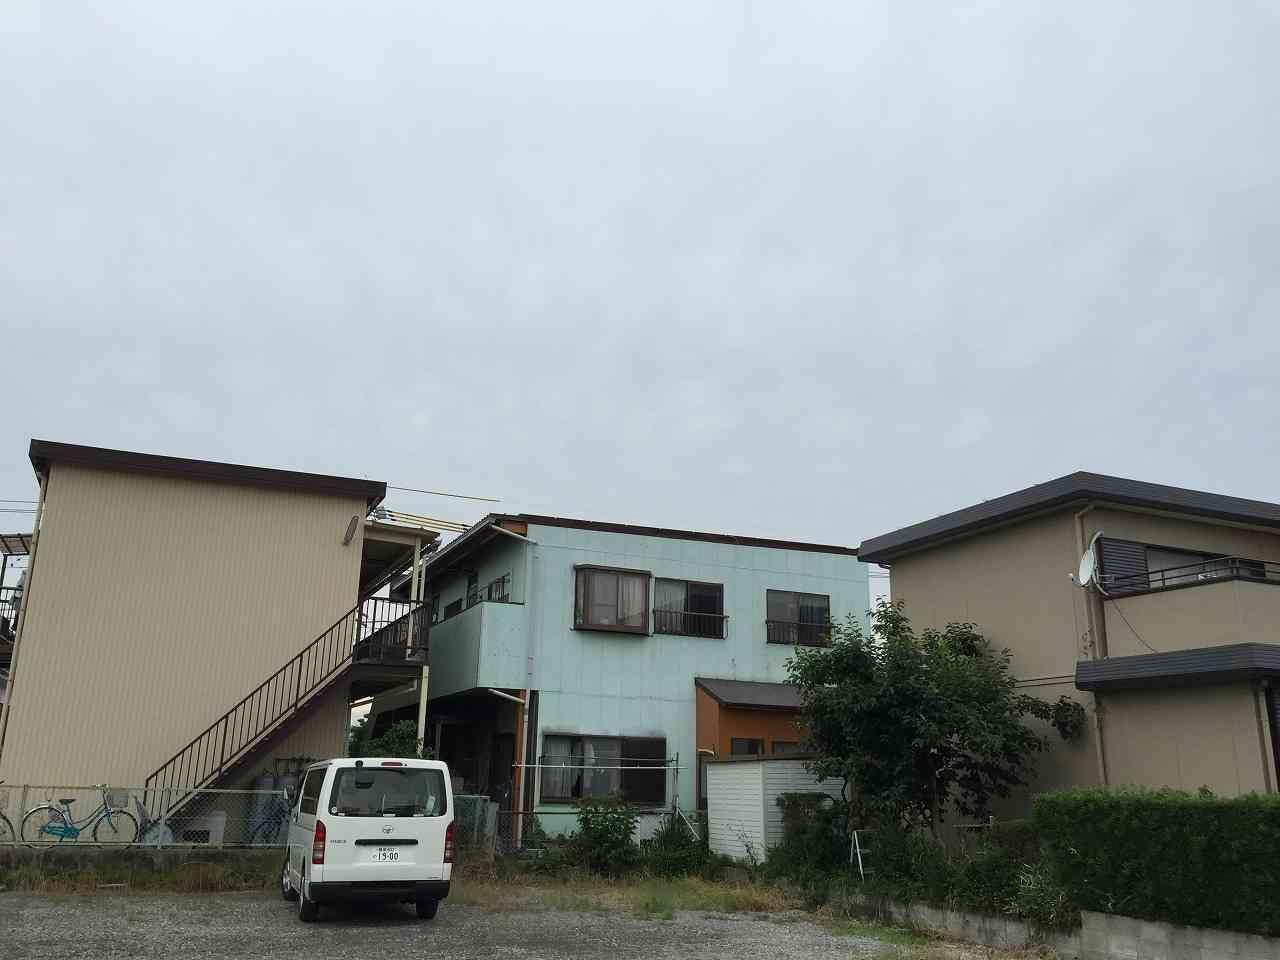 三重県鈴鹿市 M様邸 の写真